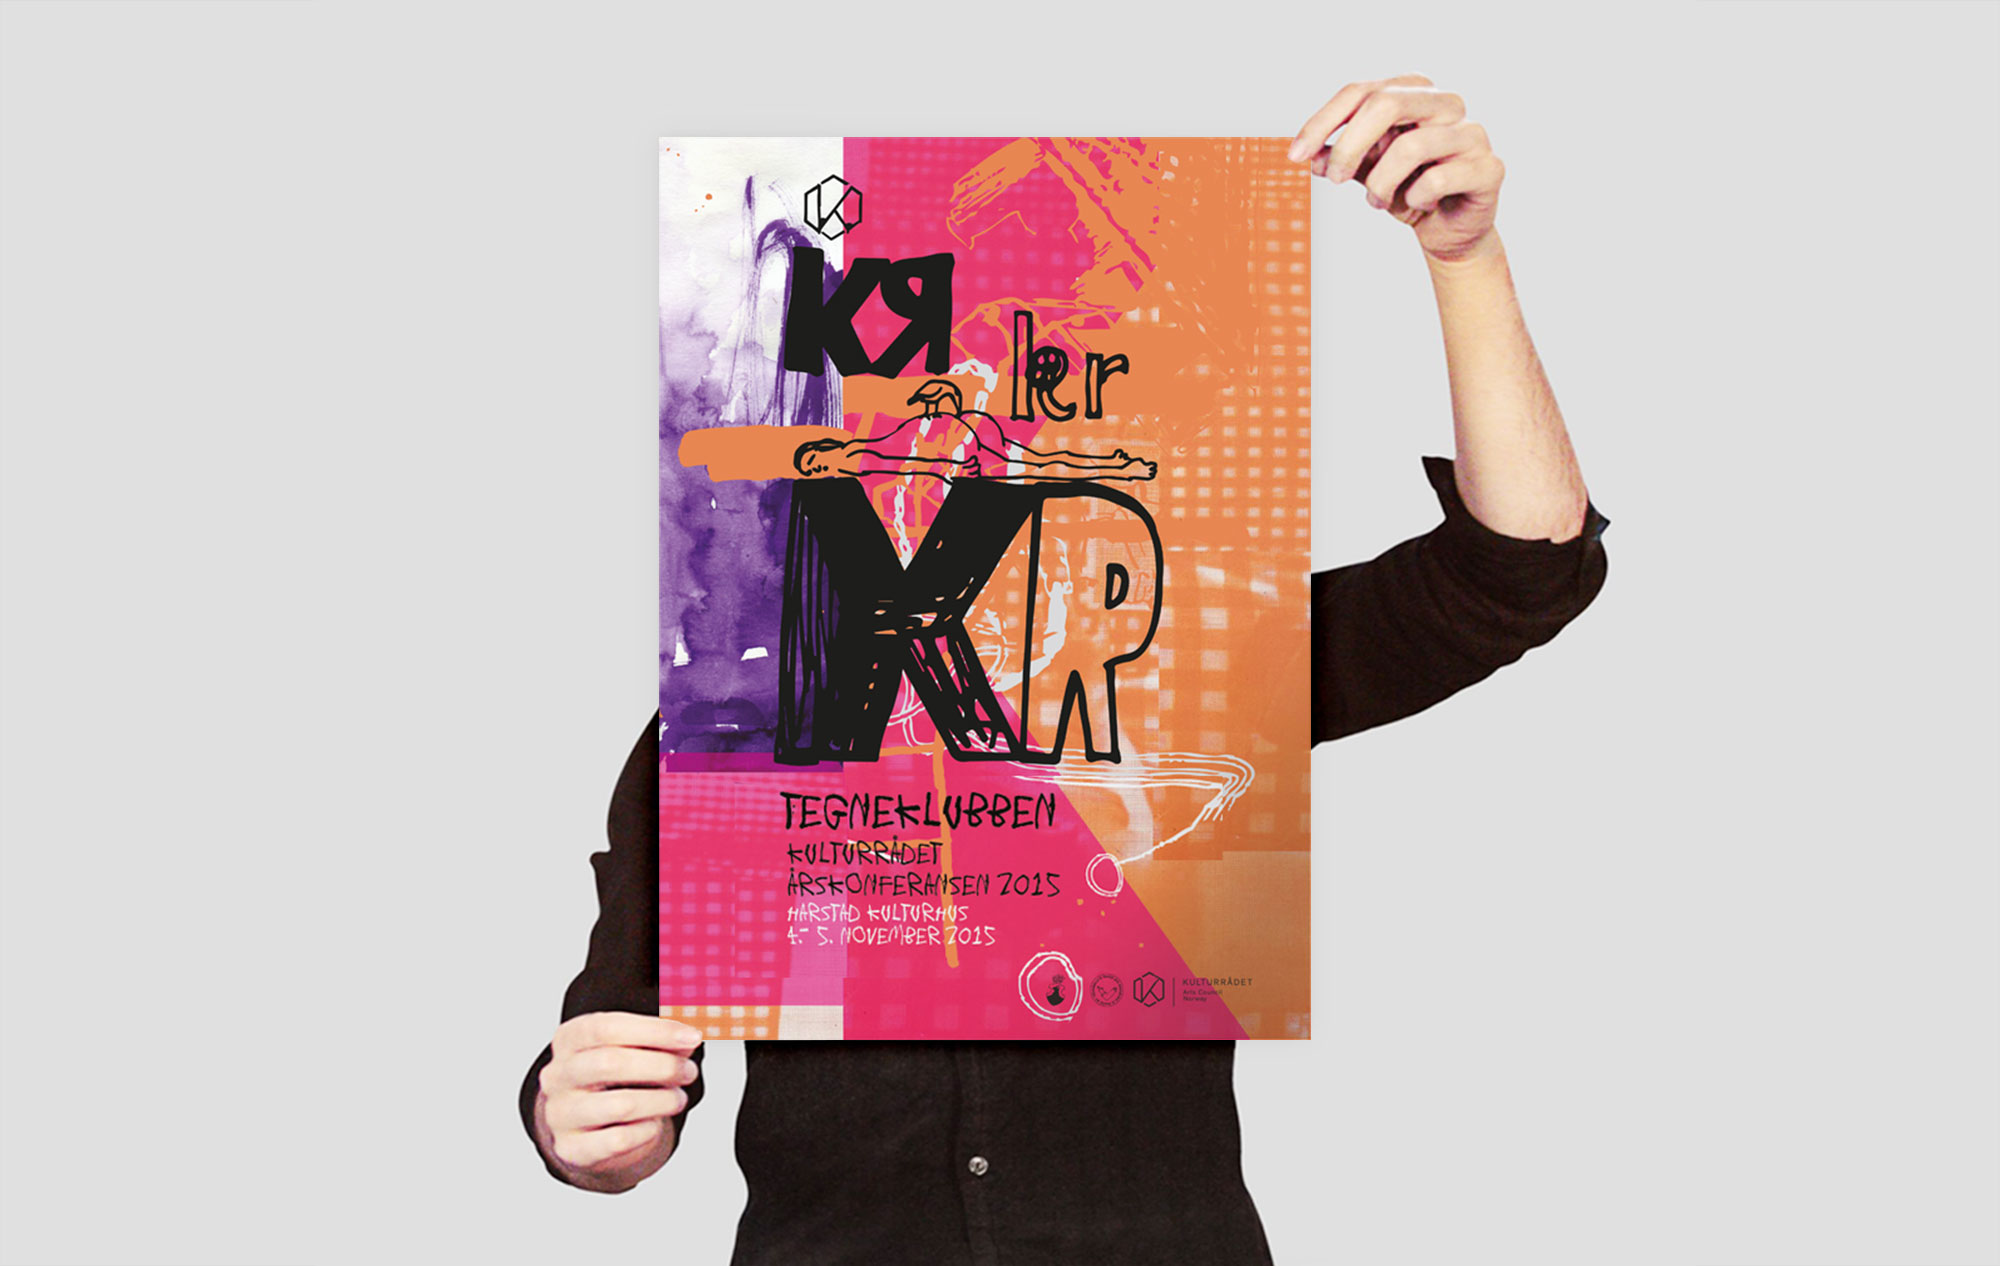 Tegneklubben Poster 2